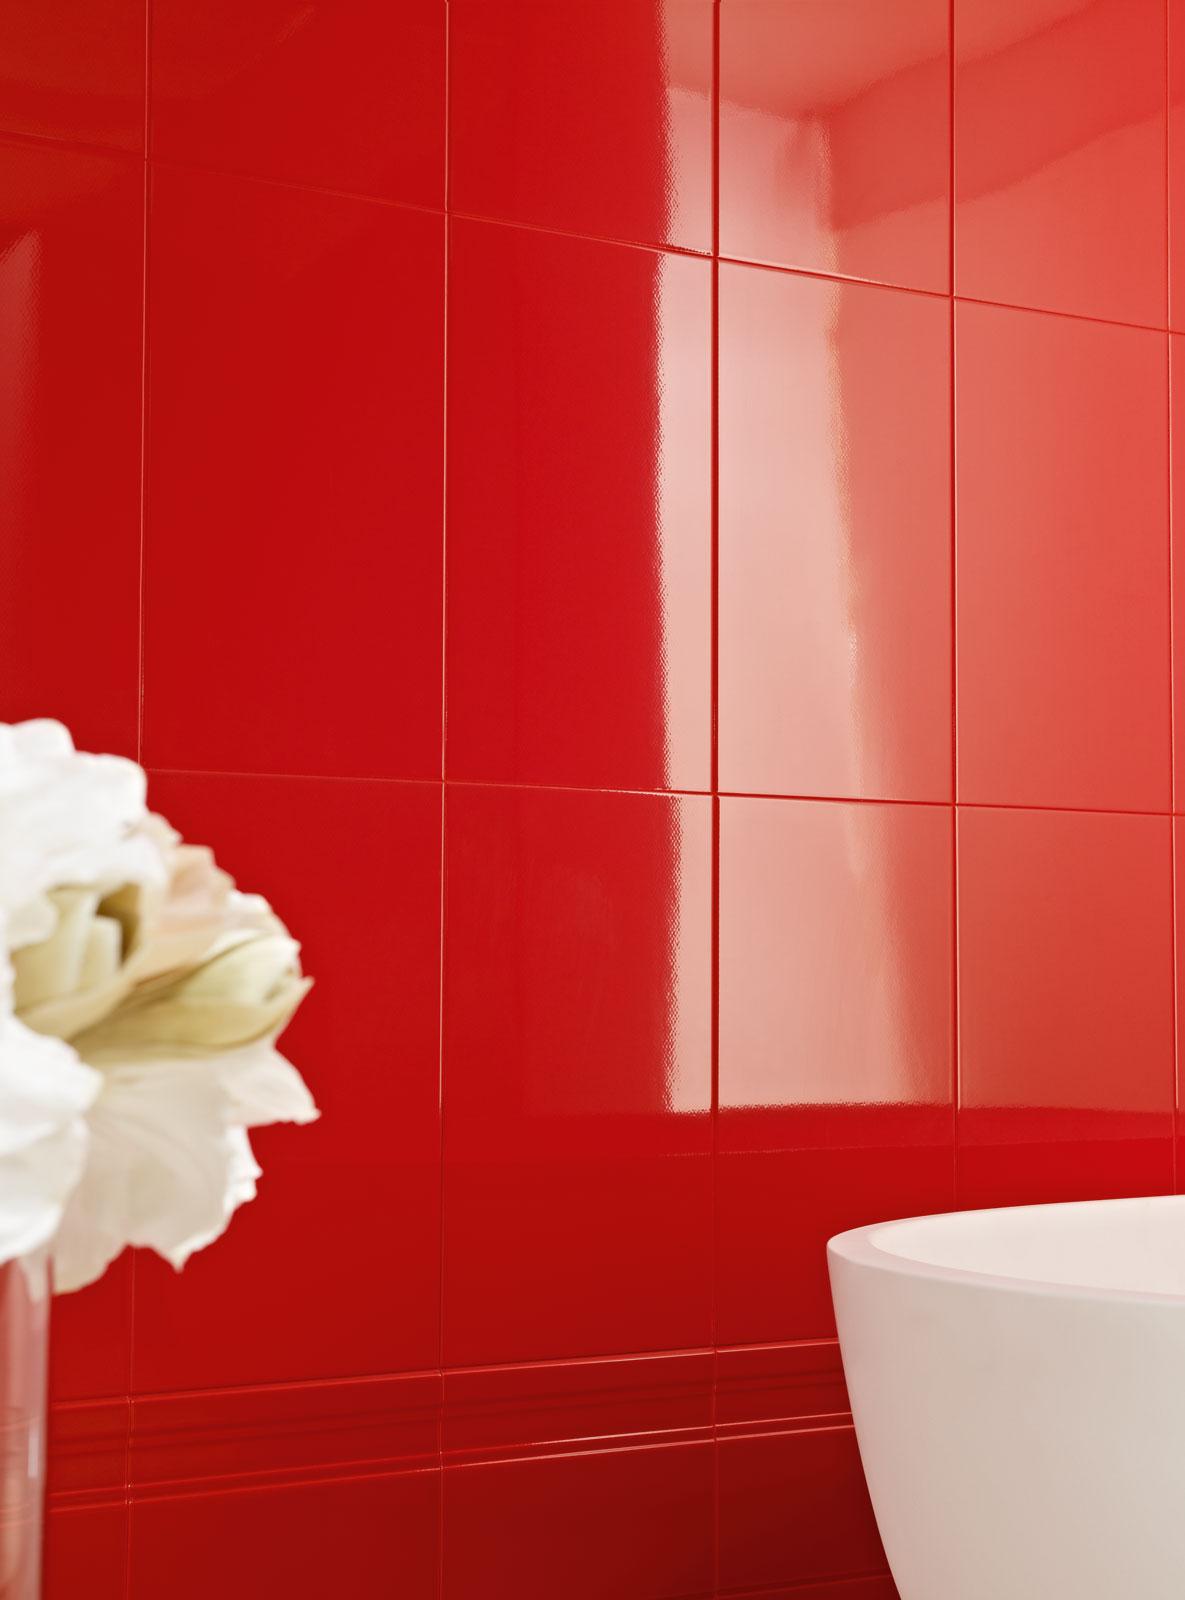 Palace marazzi - Piastrelle rosse lucide ...